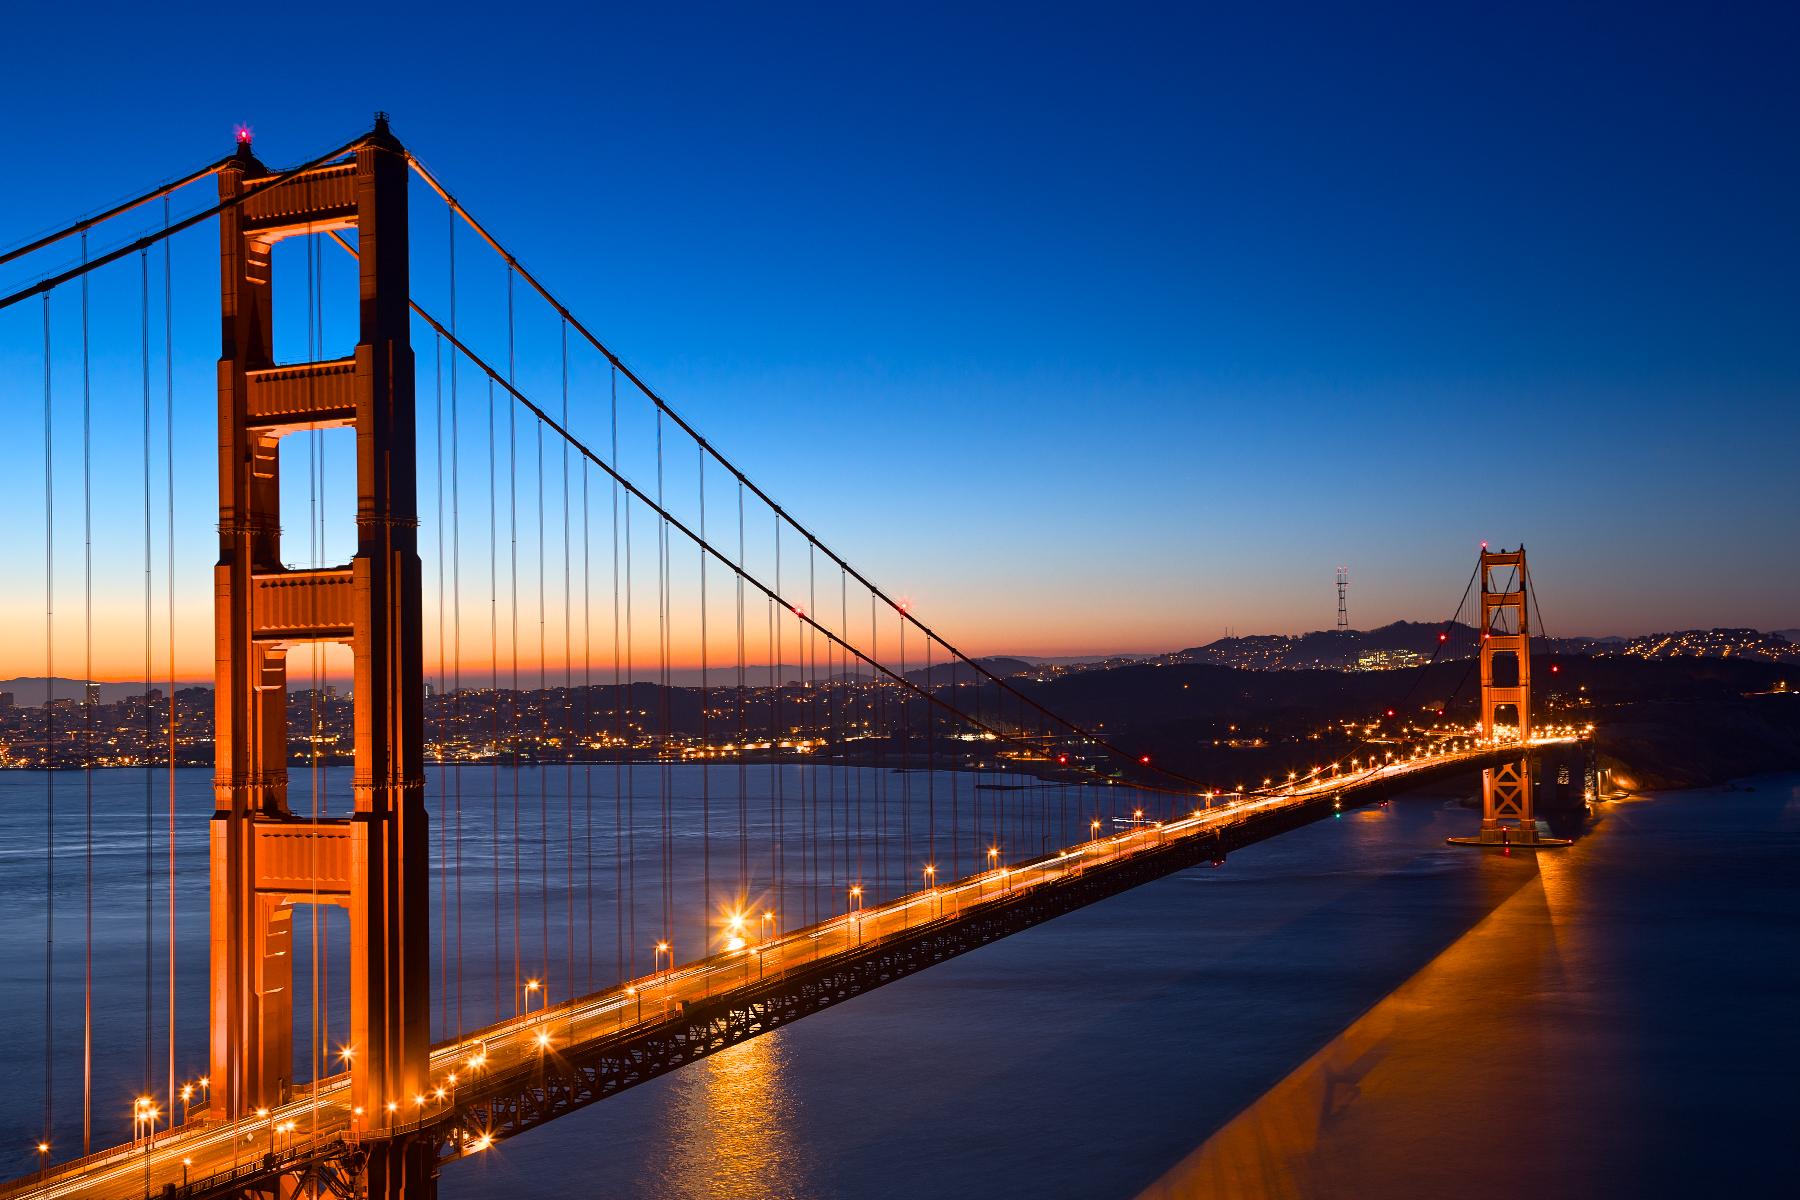 SEE & DO: GOLDEN GATE BRIDGE